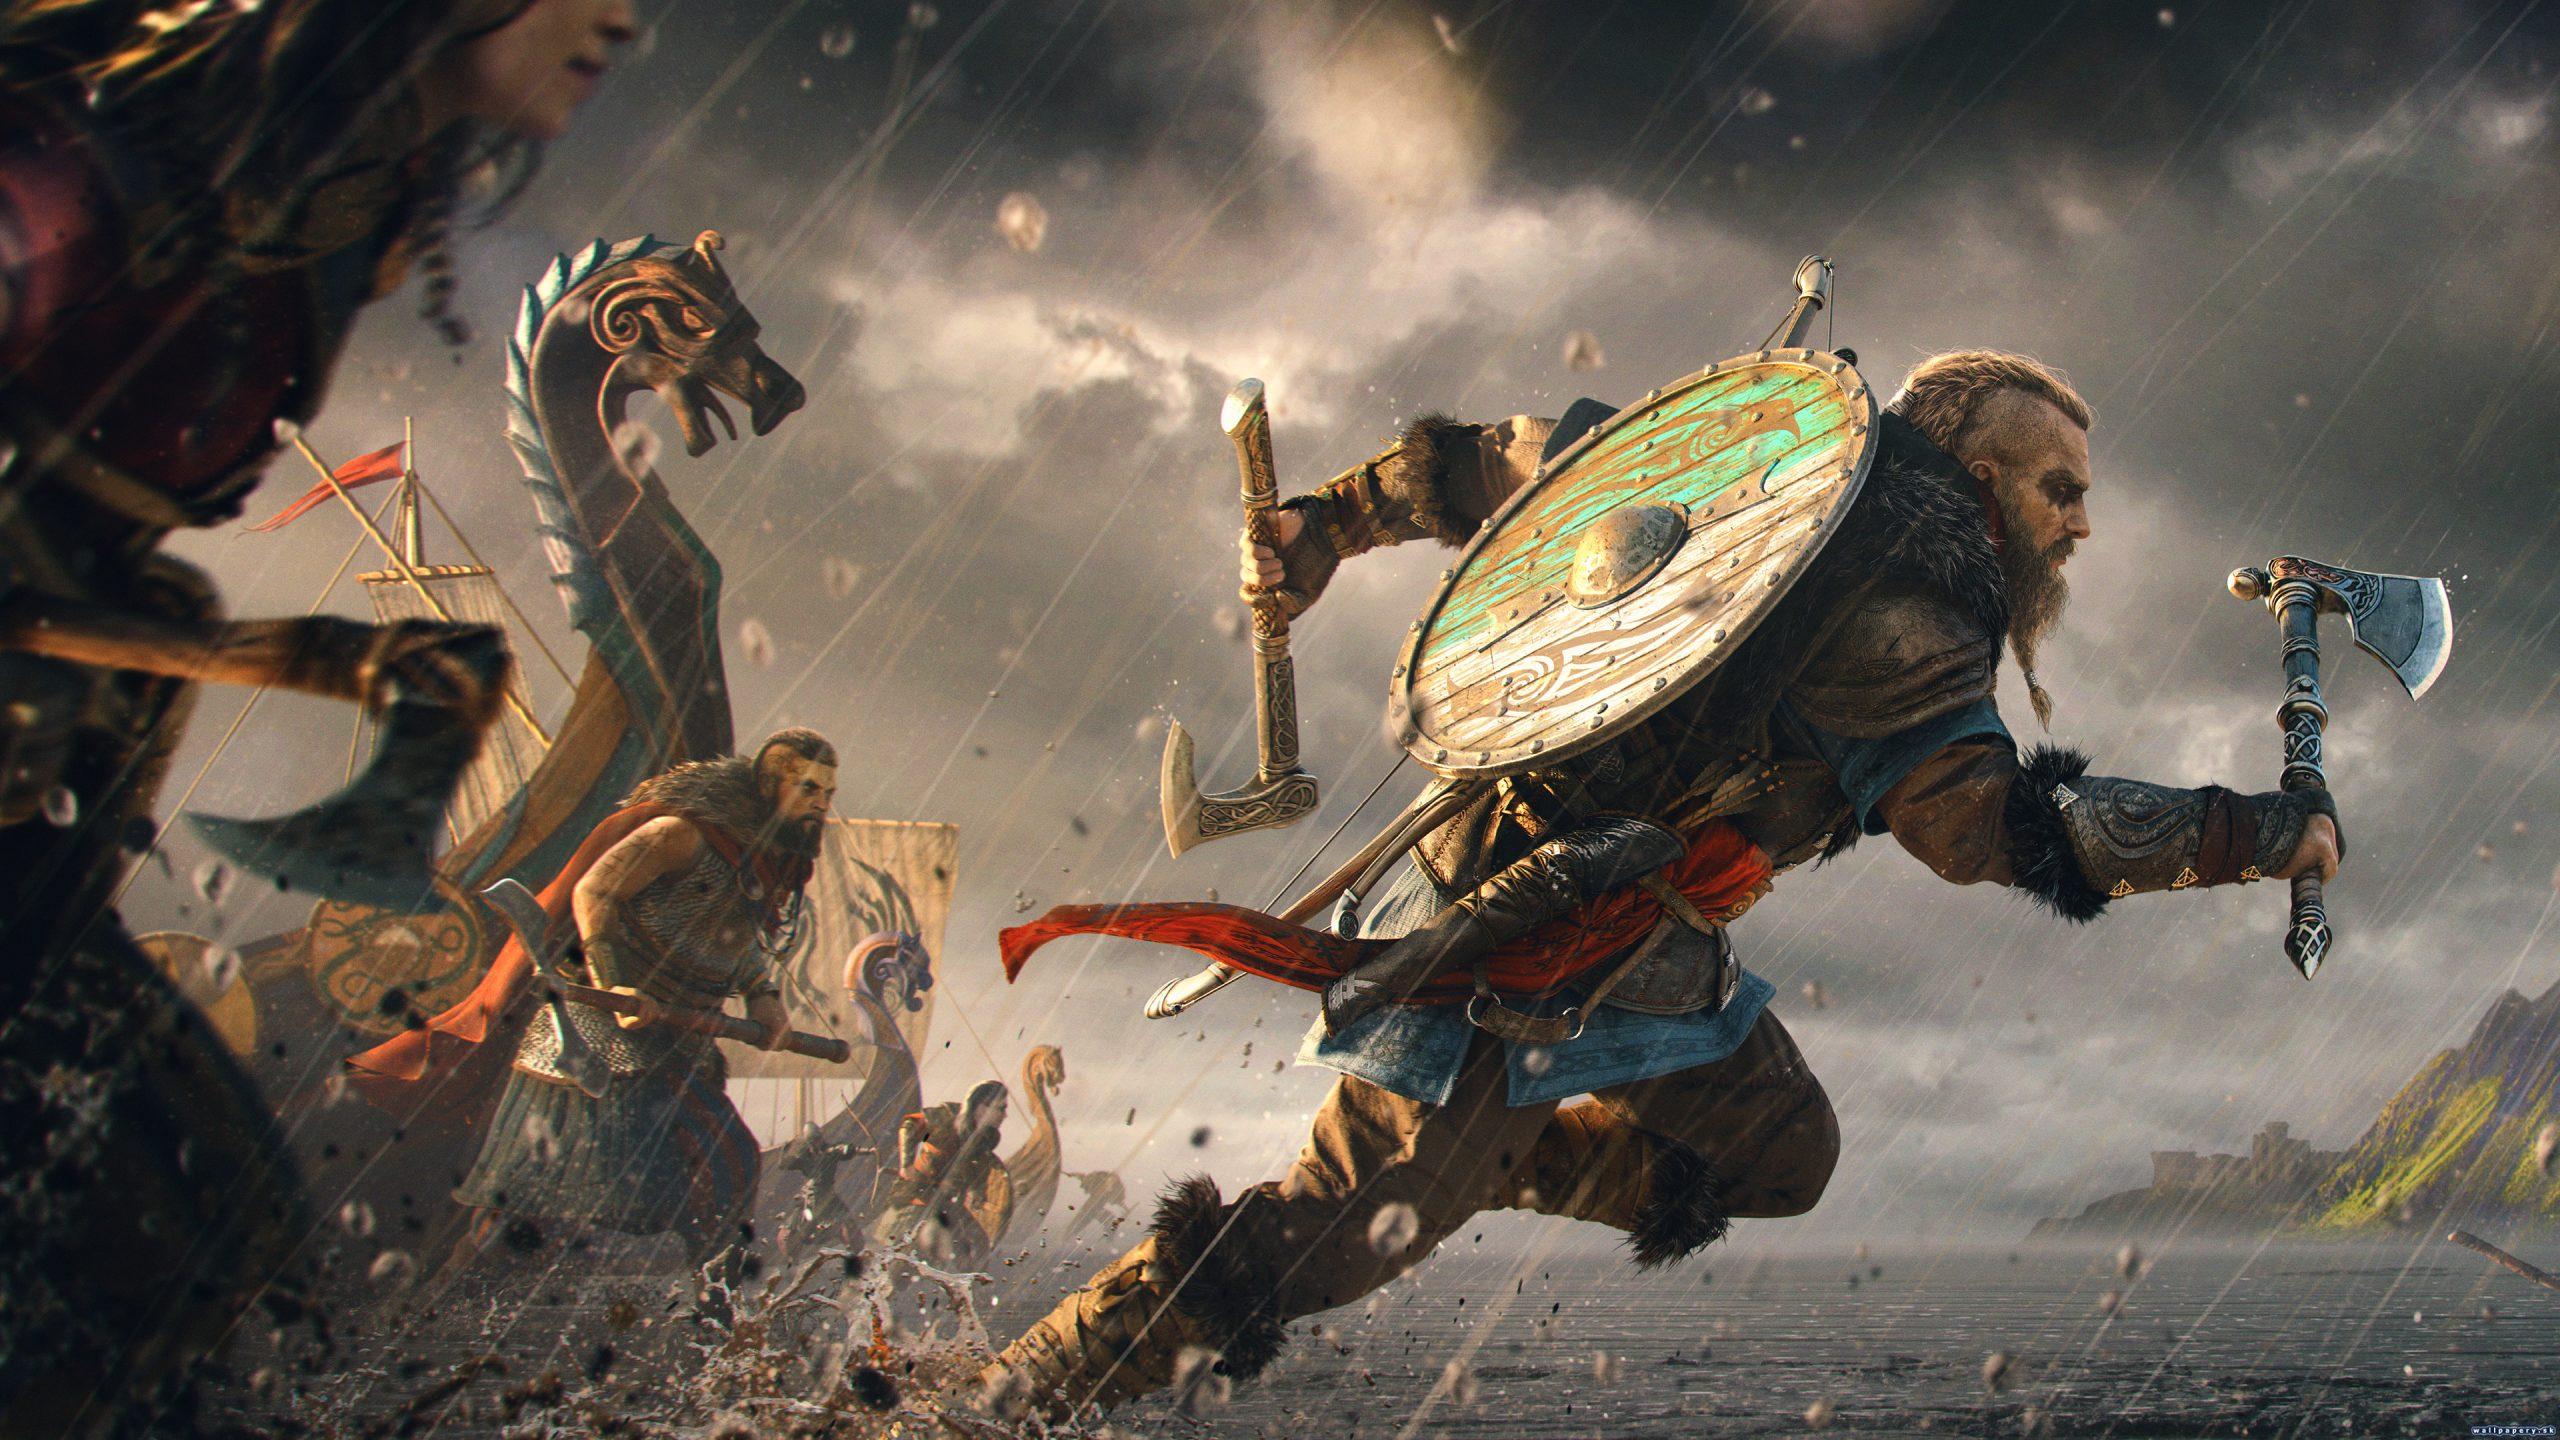 Secretos de los escudos vikingos son finalmente revelados